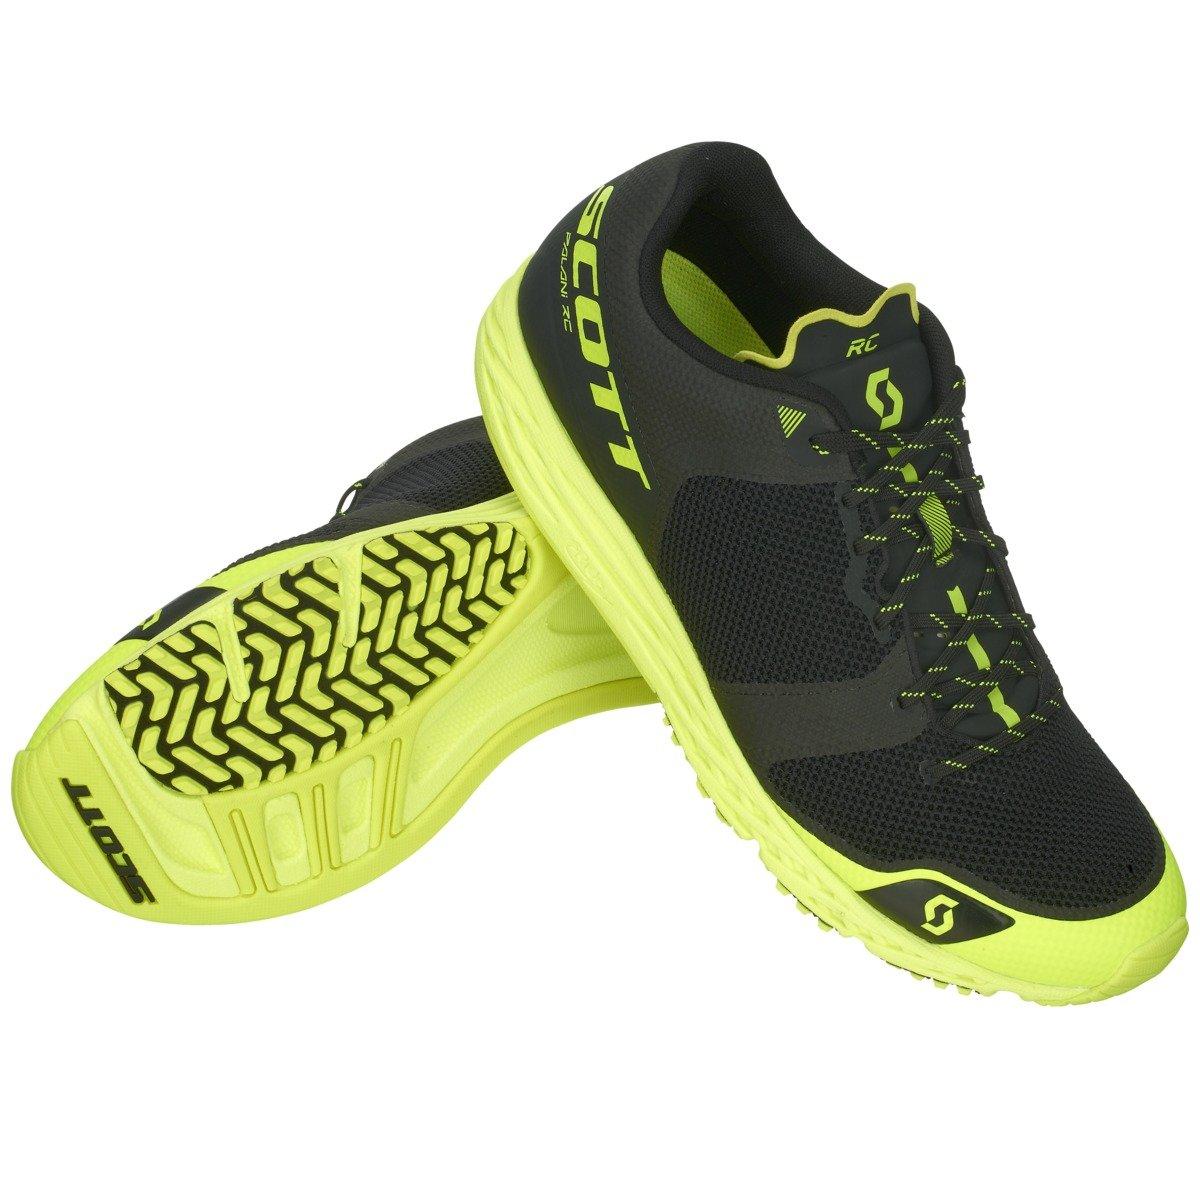 Scott Damen Laufschuhe Laufschuhe Damen W's Palani RC schwarz Gelb 5 5 dc0ca9